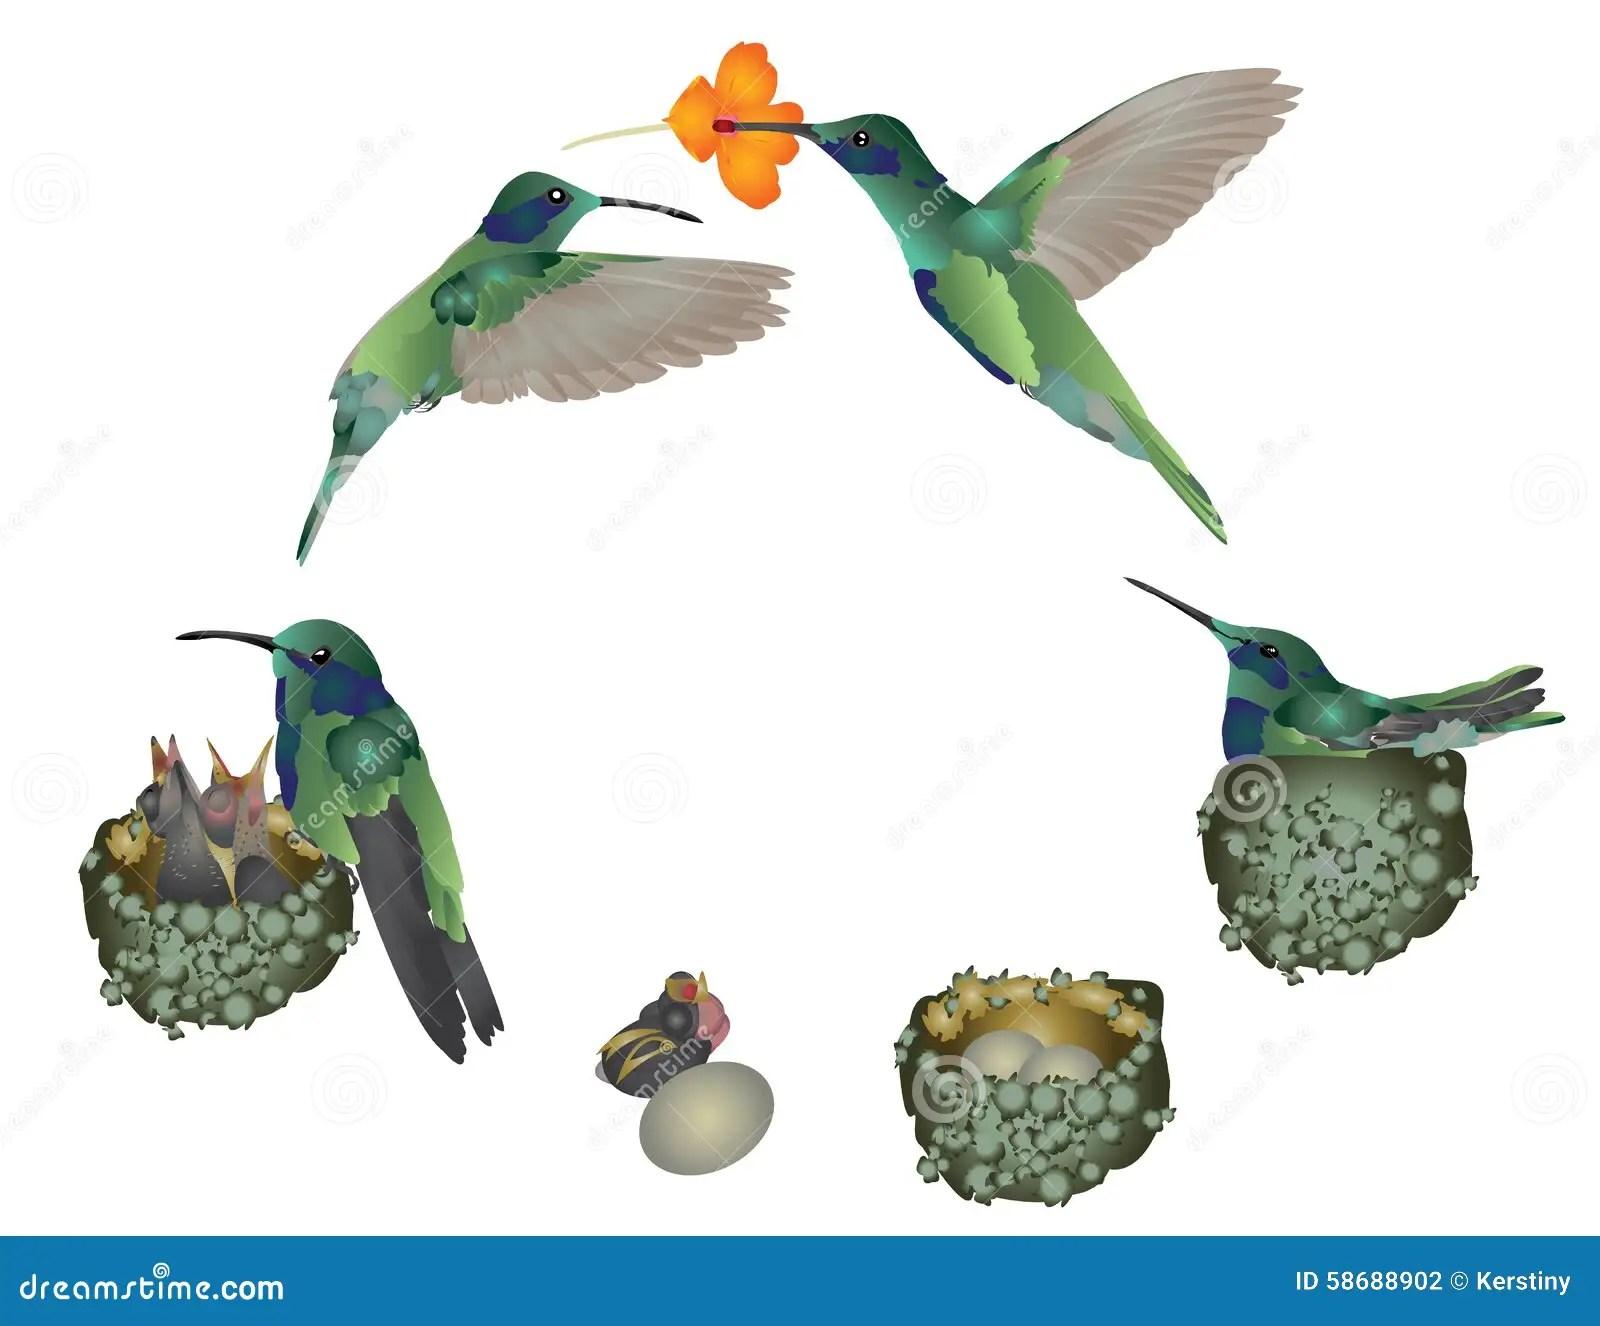 bird life cycle diagram crochet flower pattern of hummingbird stock illustration